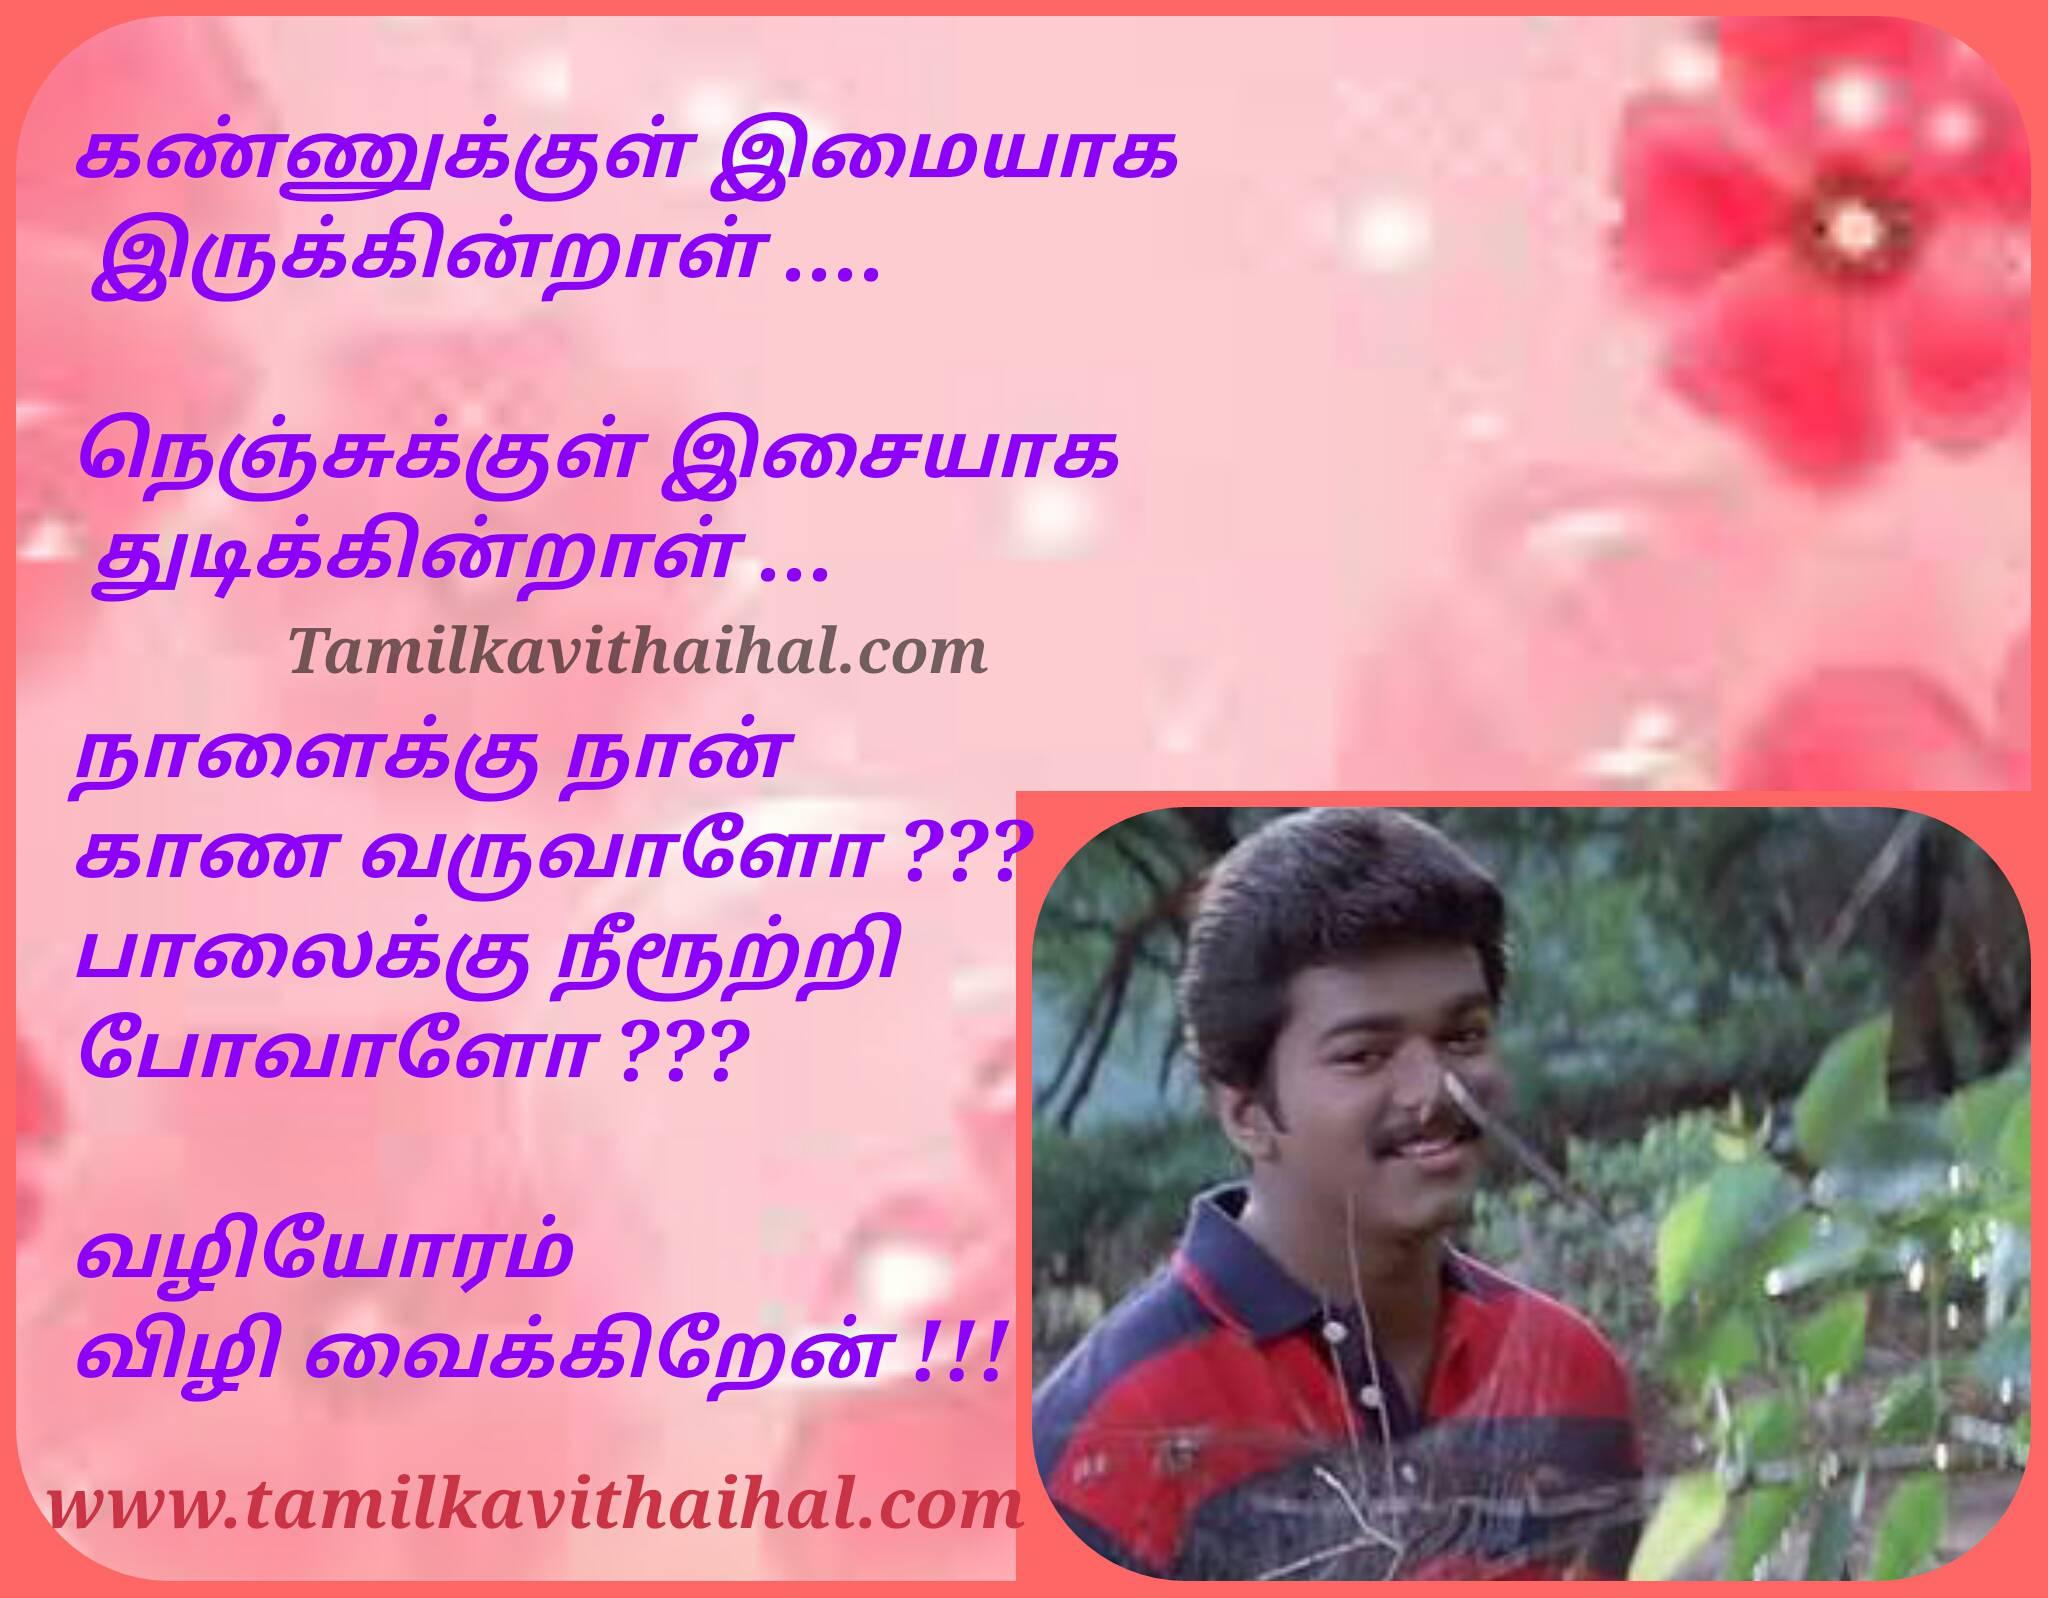 Vijay shalini song quotes kadhaluku maryathai kannukul imayaga ilayaraja vairamuthu whatsapp profile